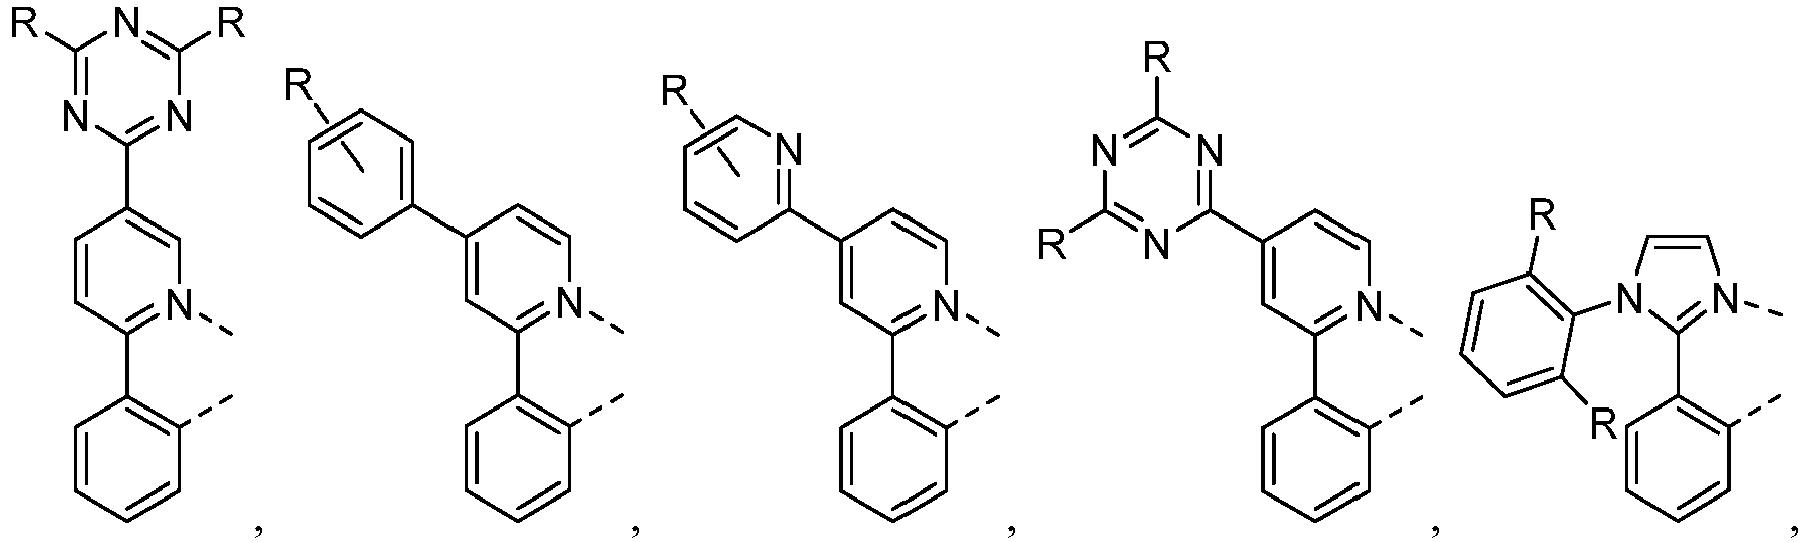 Figure imgb0331